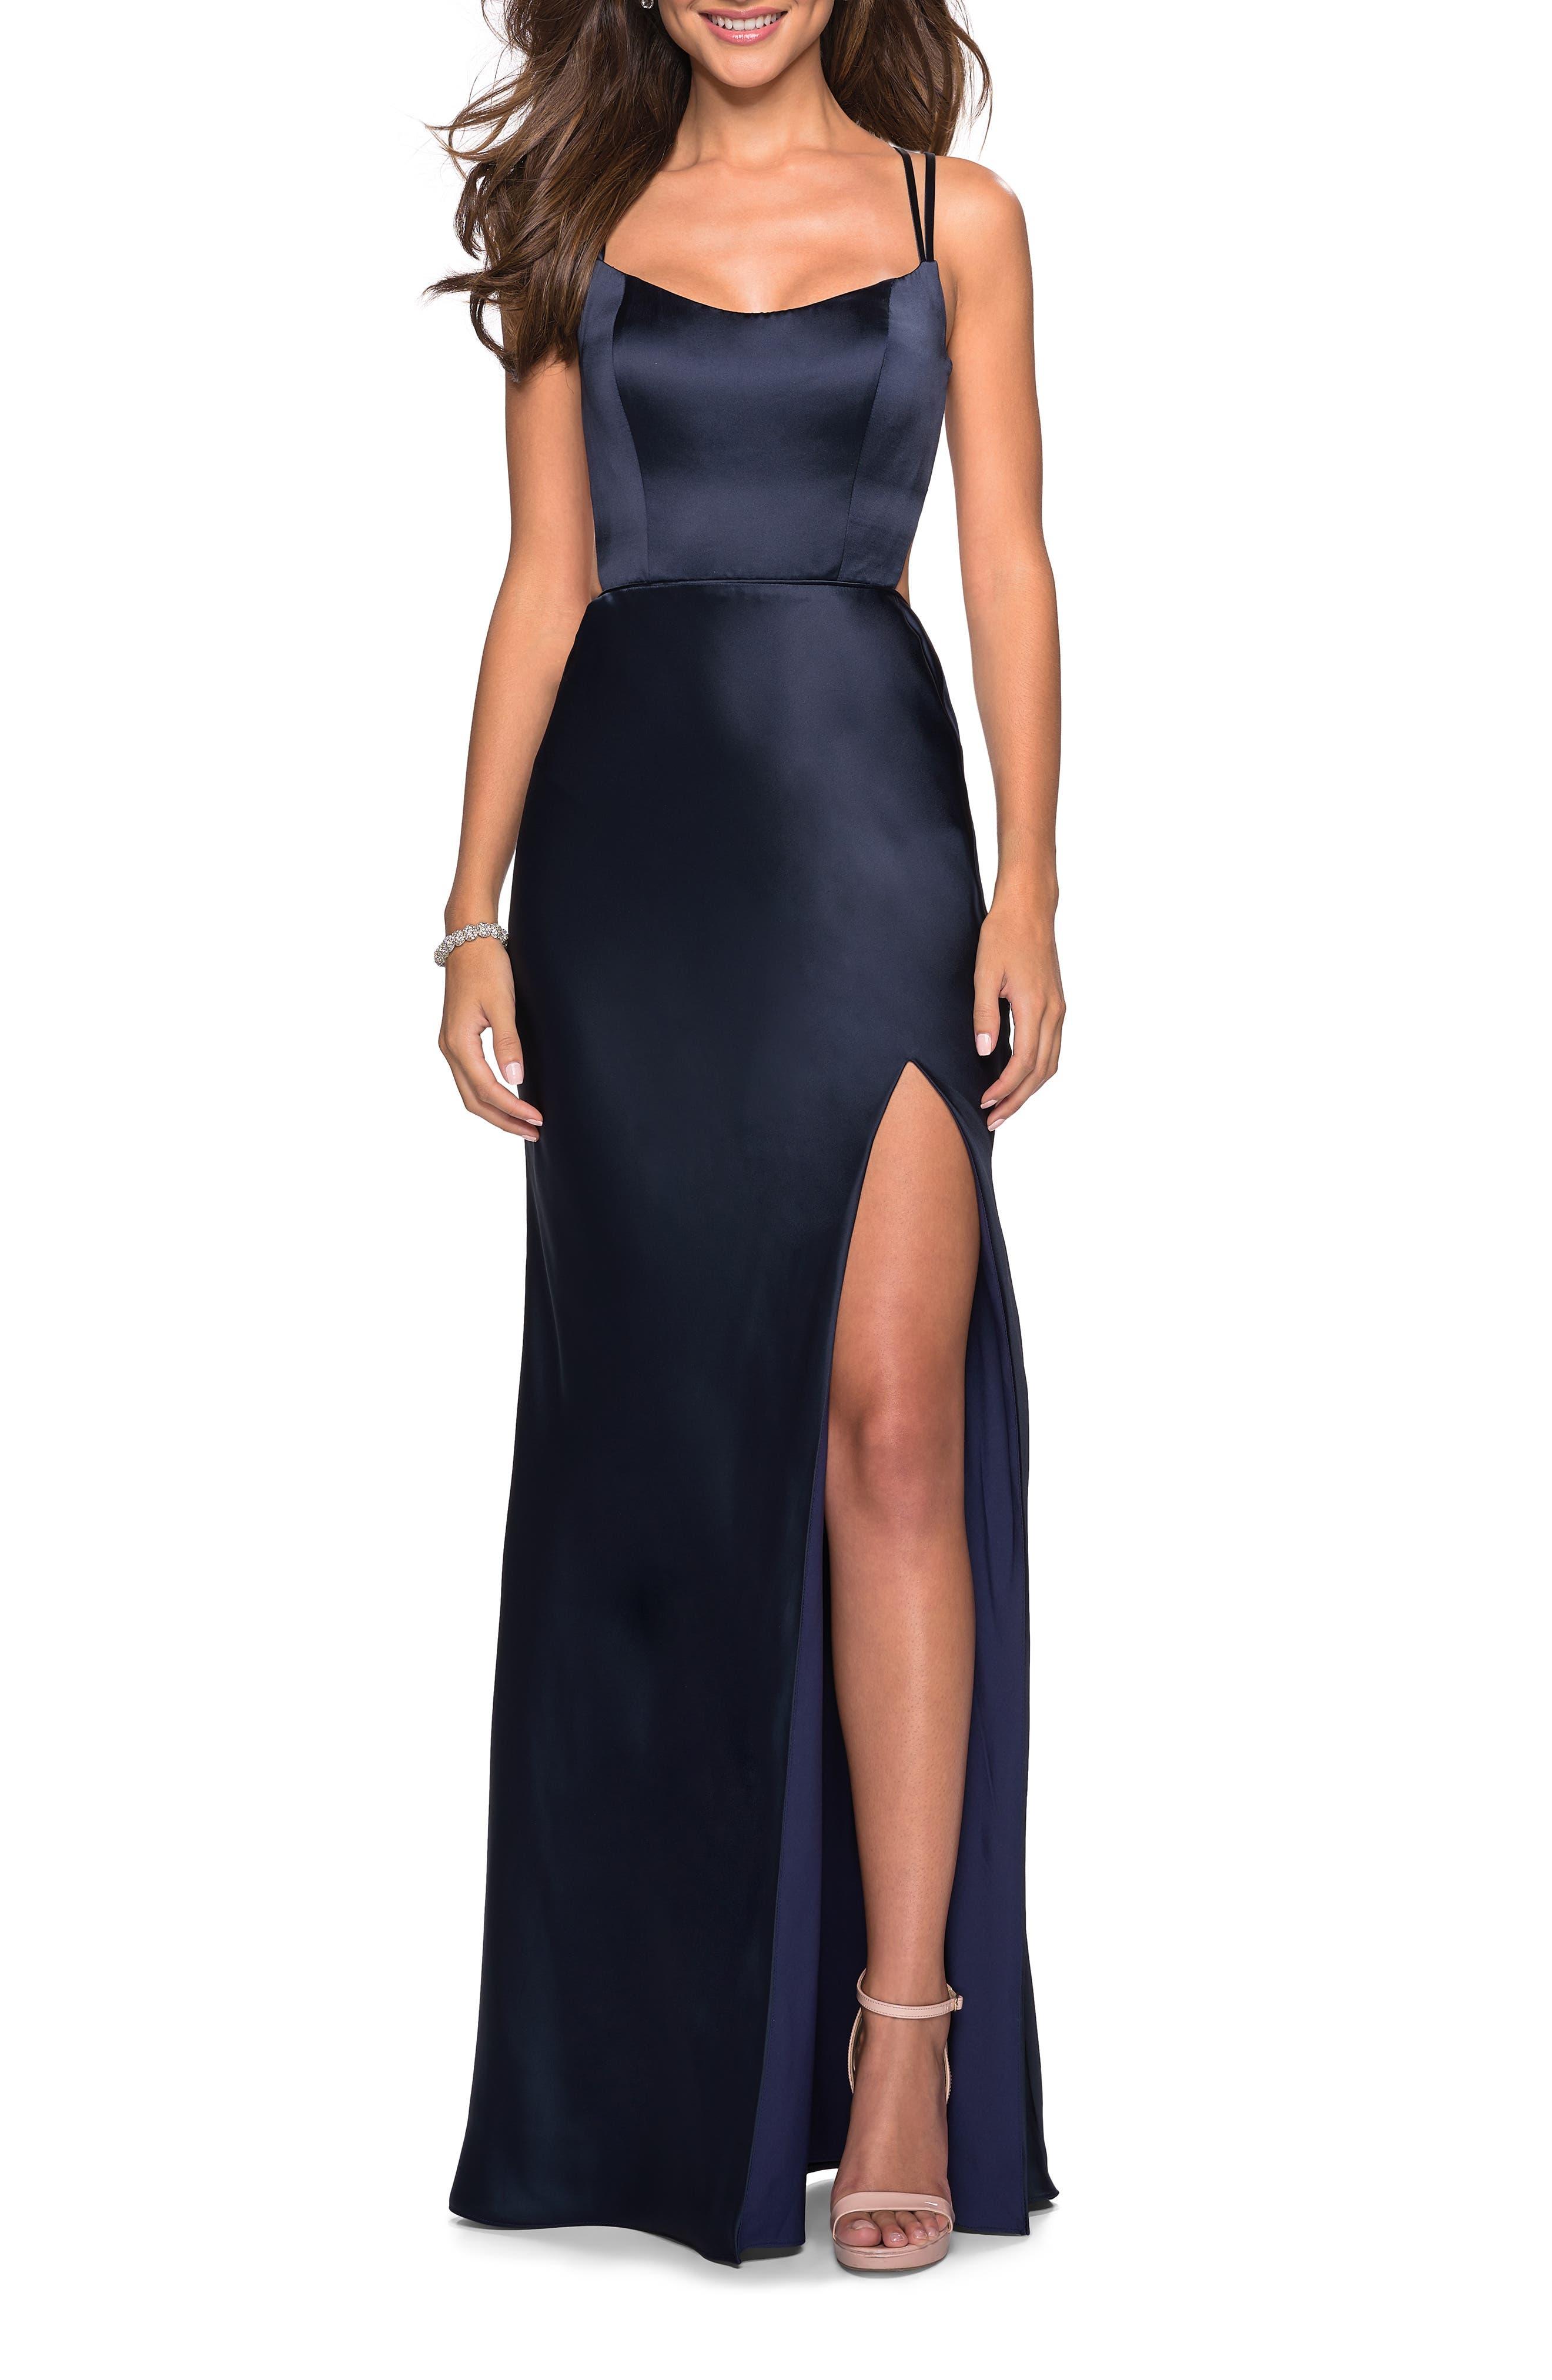 La Femme Strappy Back Fitted Satin Evening Dress, Blue